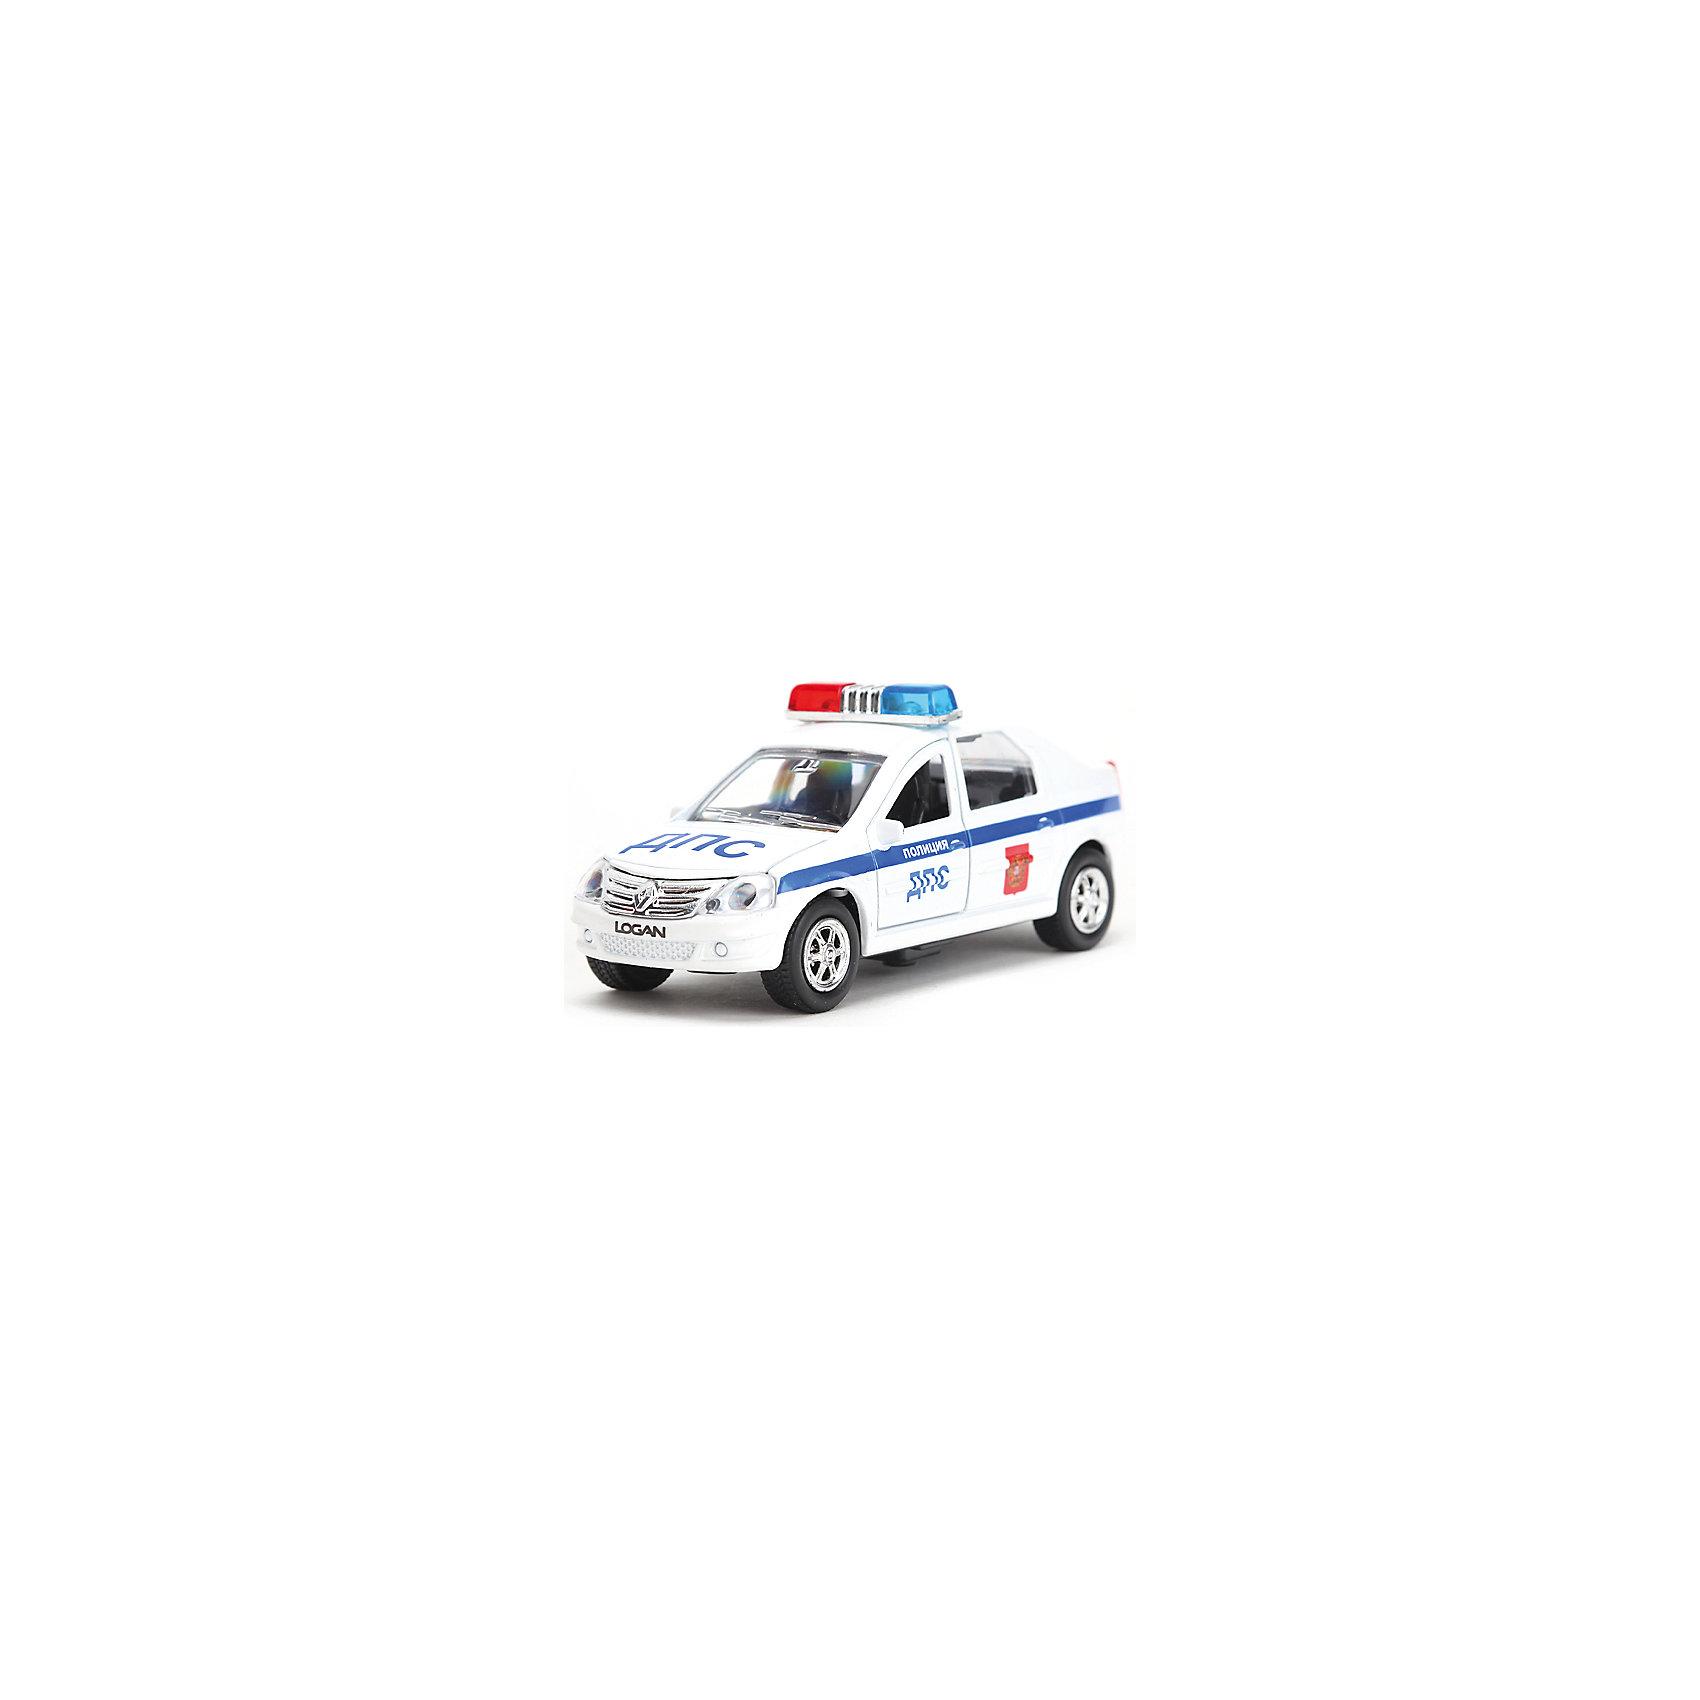 ТЕХНОПАРК Машина RENAULT LOGAN ДПС, 1:43, со светом и звуком, ТЕХНОПАРК авианосец инерционный технопарк